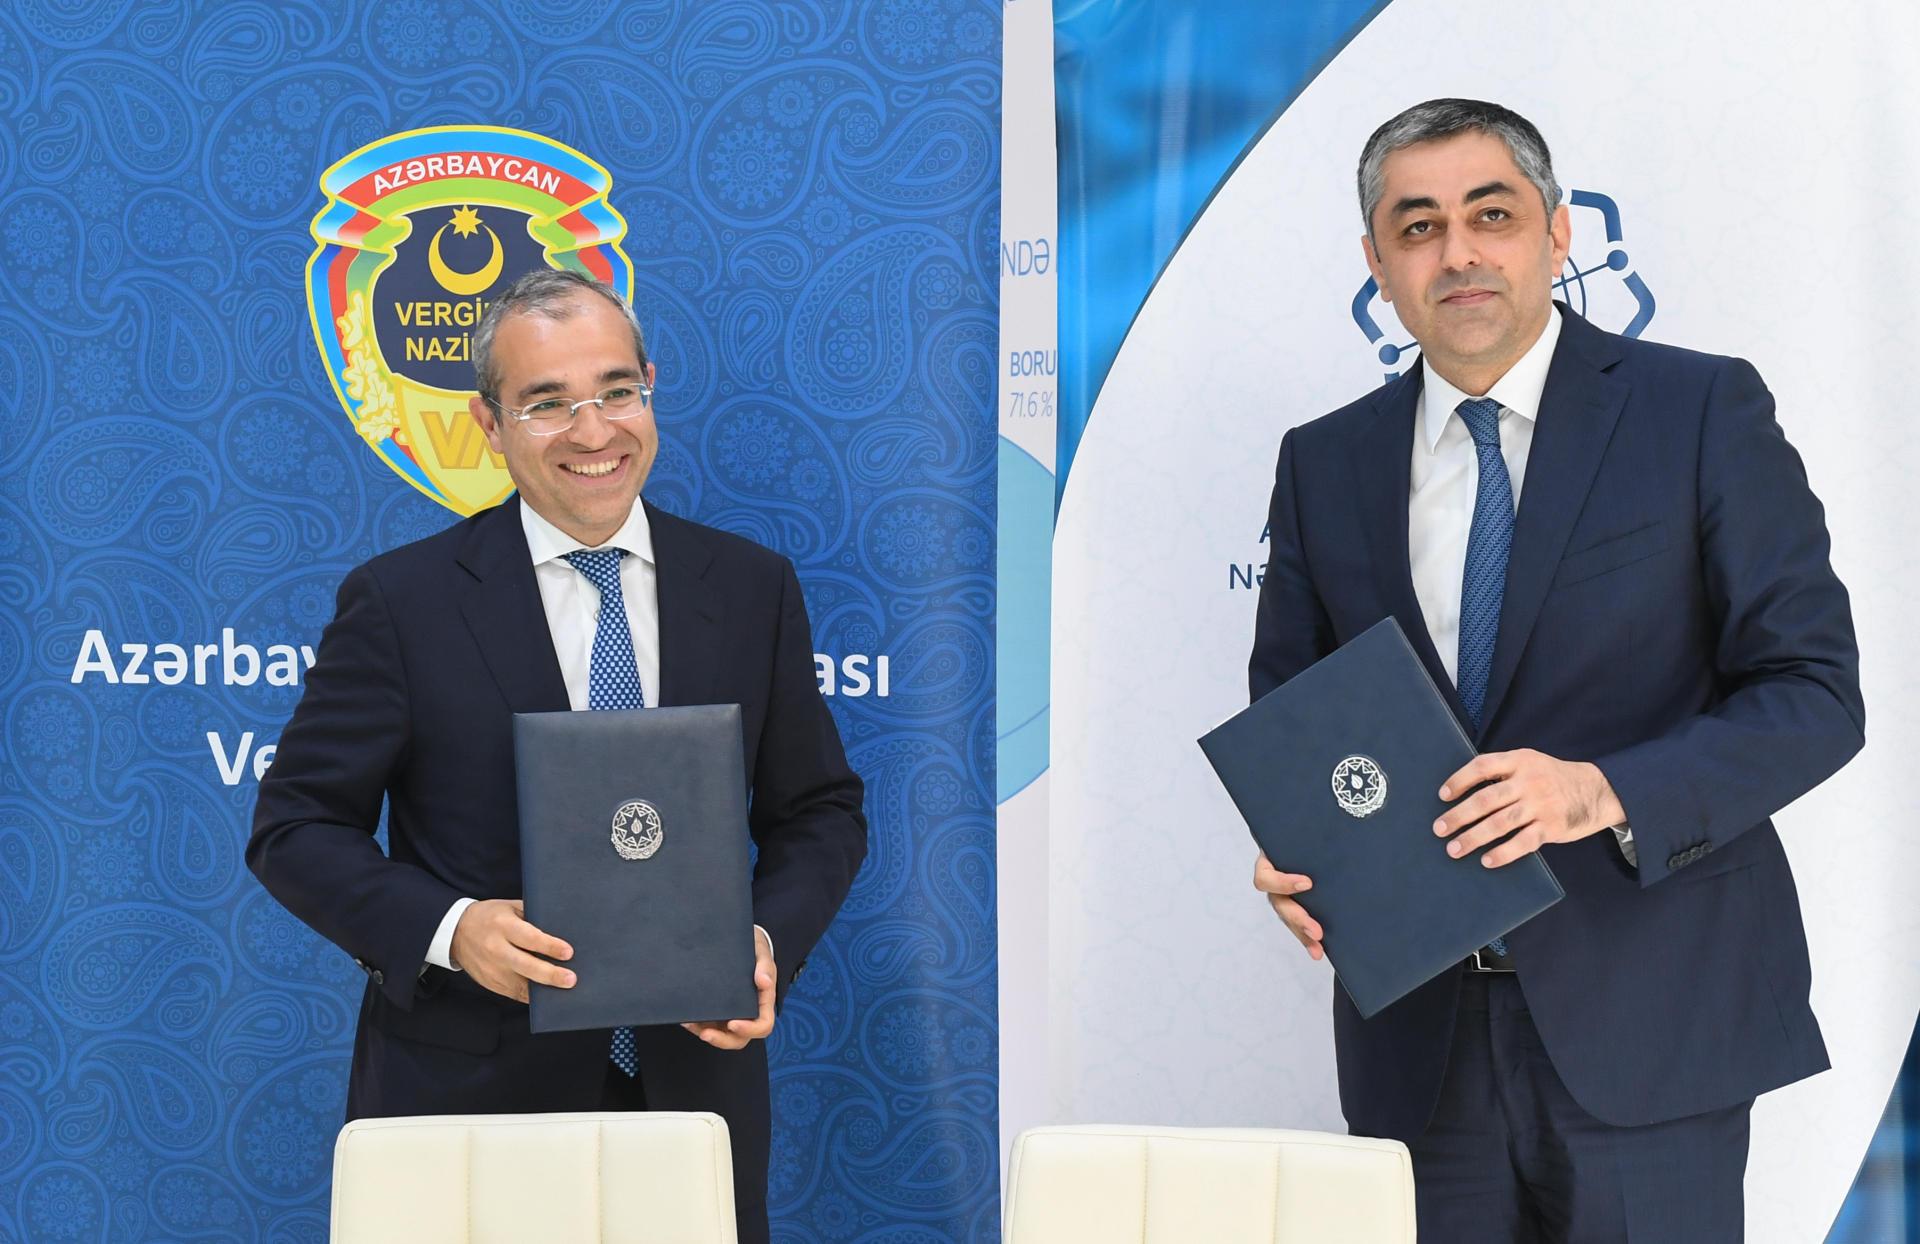 Минсвязи и Минналогов Азербайджана подписали протоколы о намерениях (ФОТО)